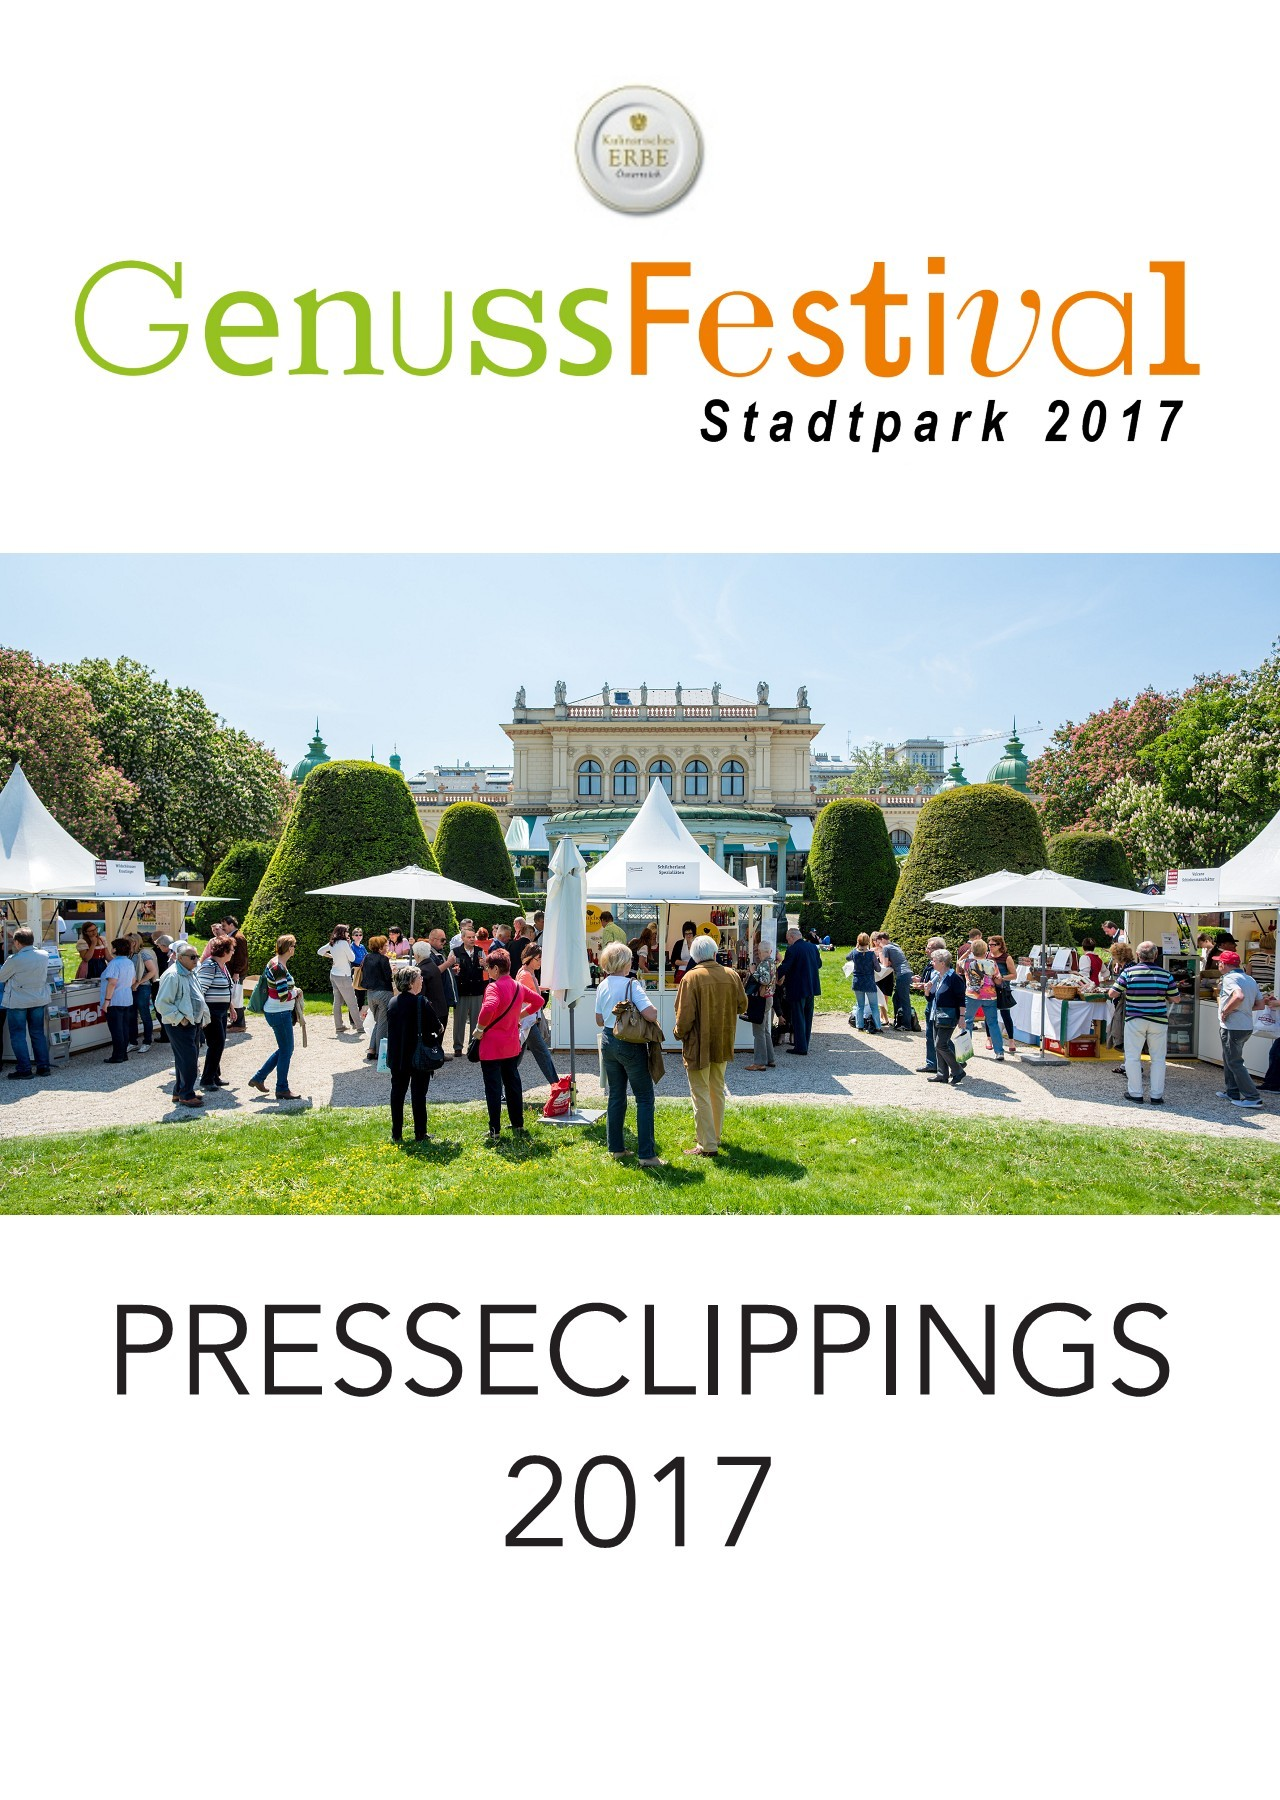 Genussfestival 2017 Pressemappe Pubhtml5